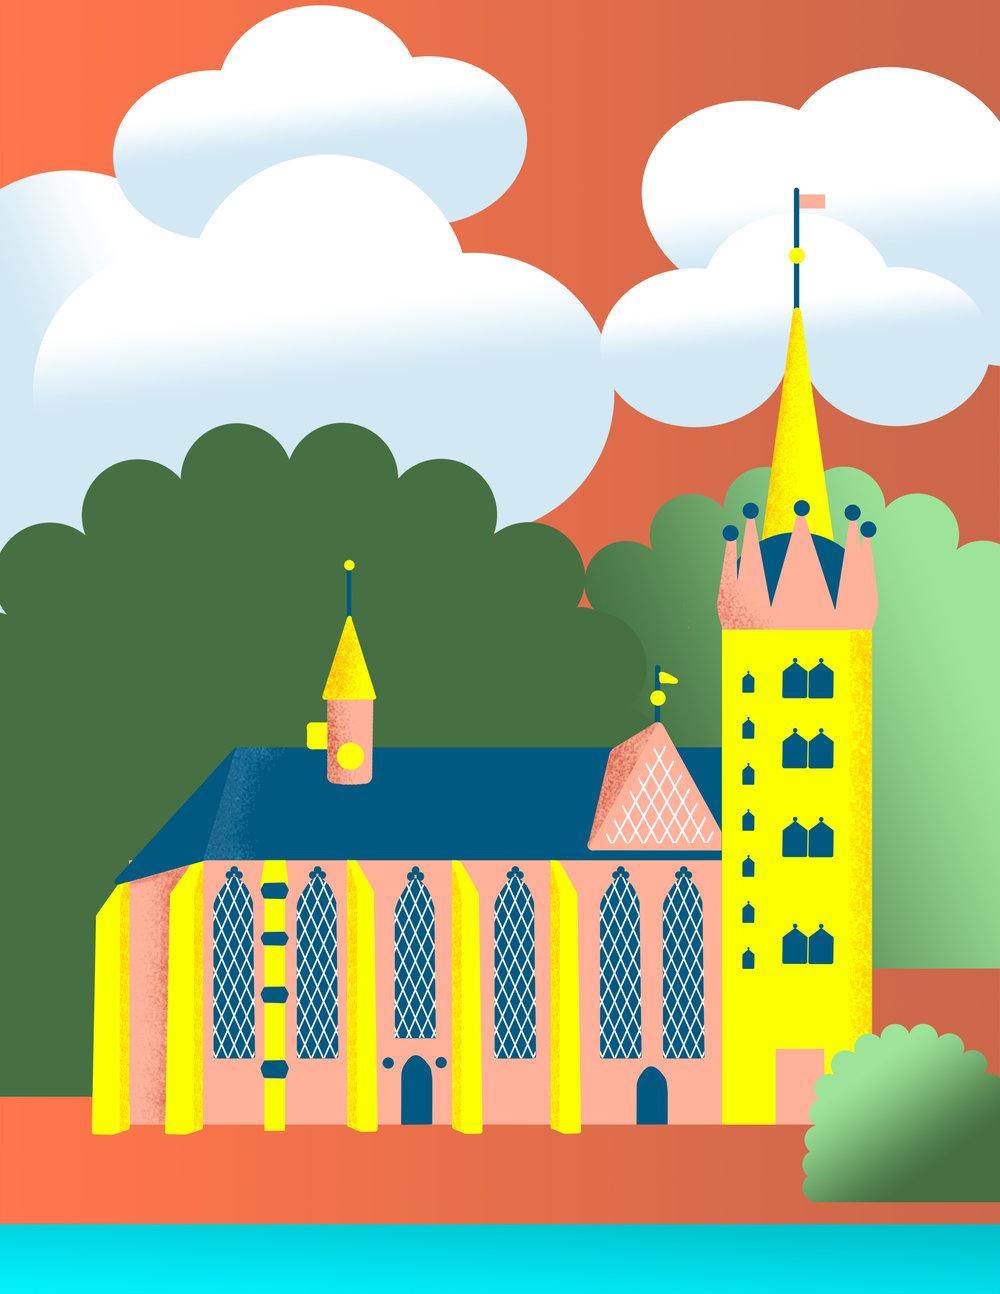 Graphic_Schlosskirche.jpg